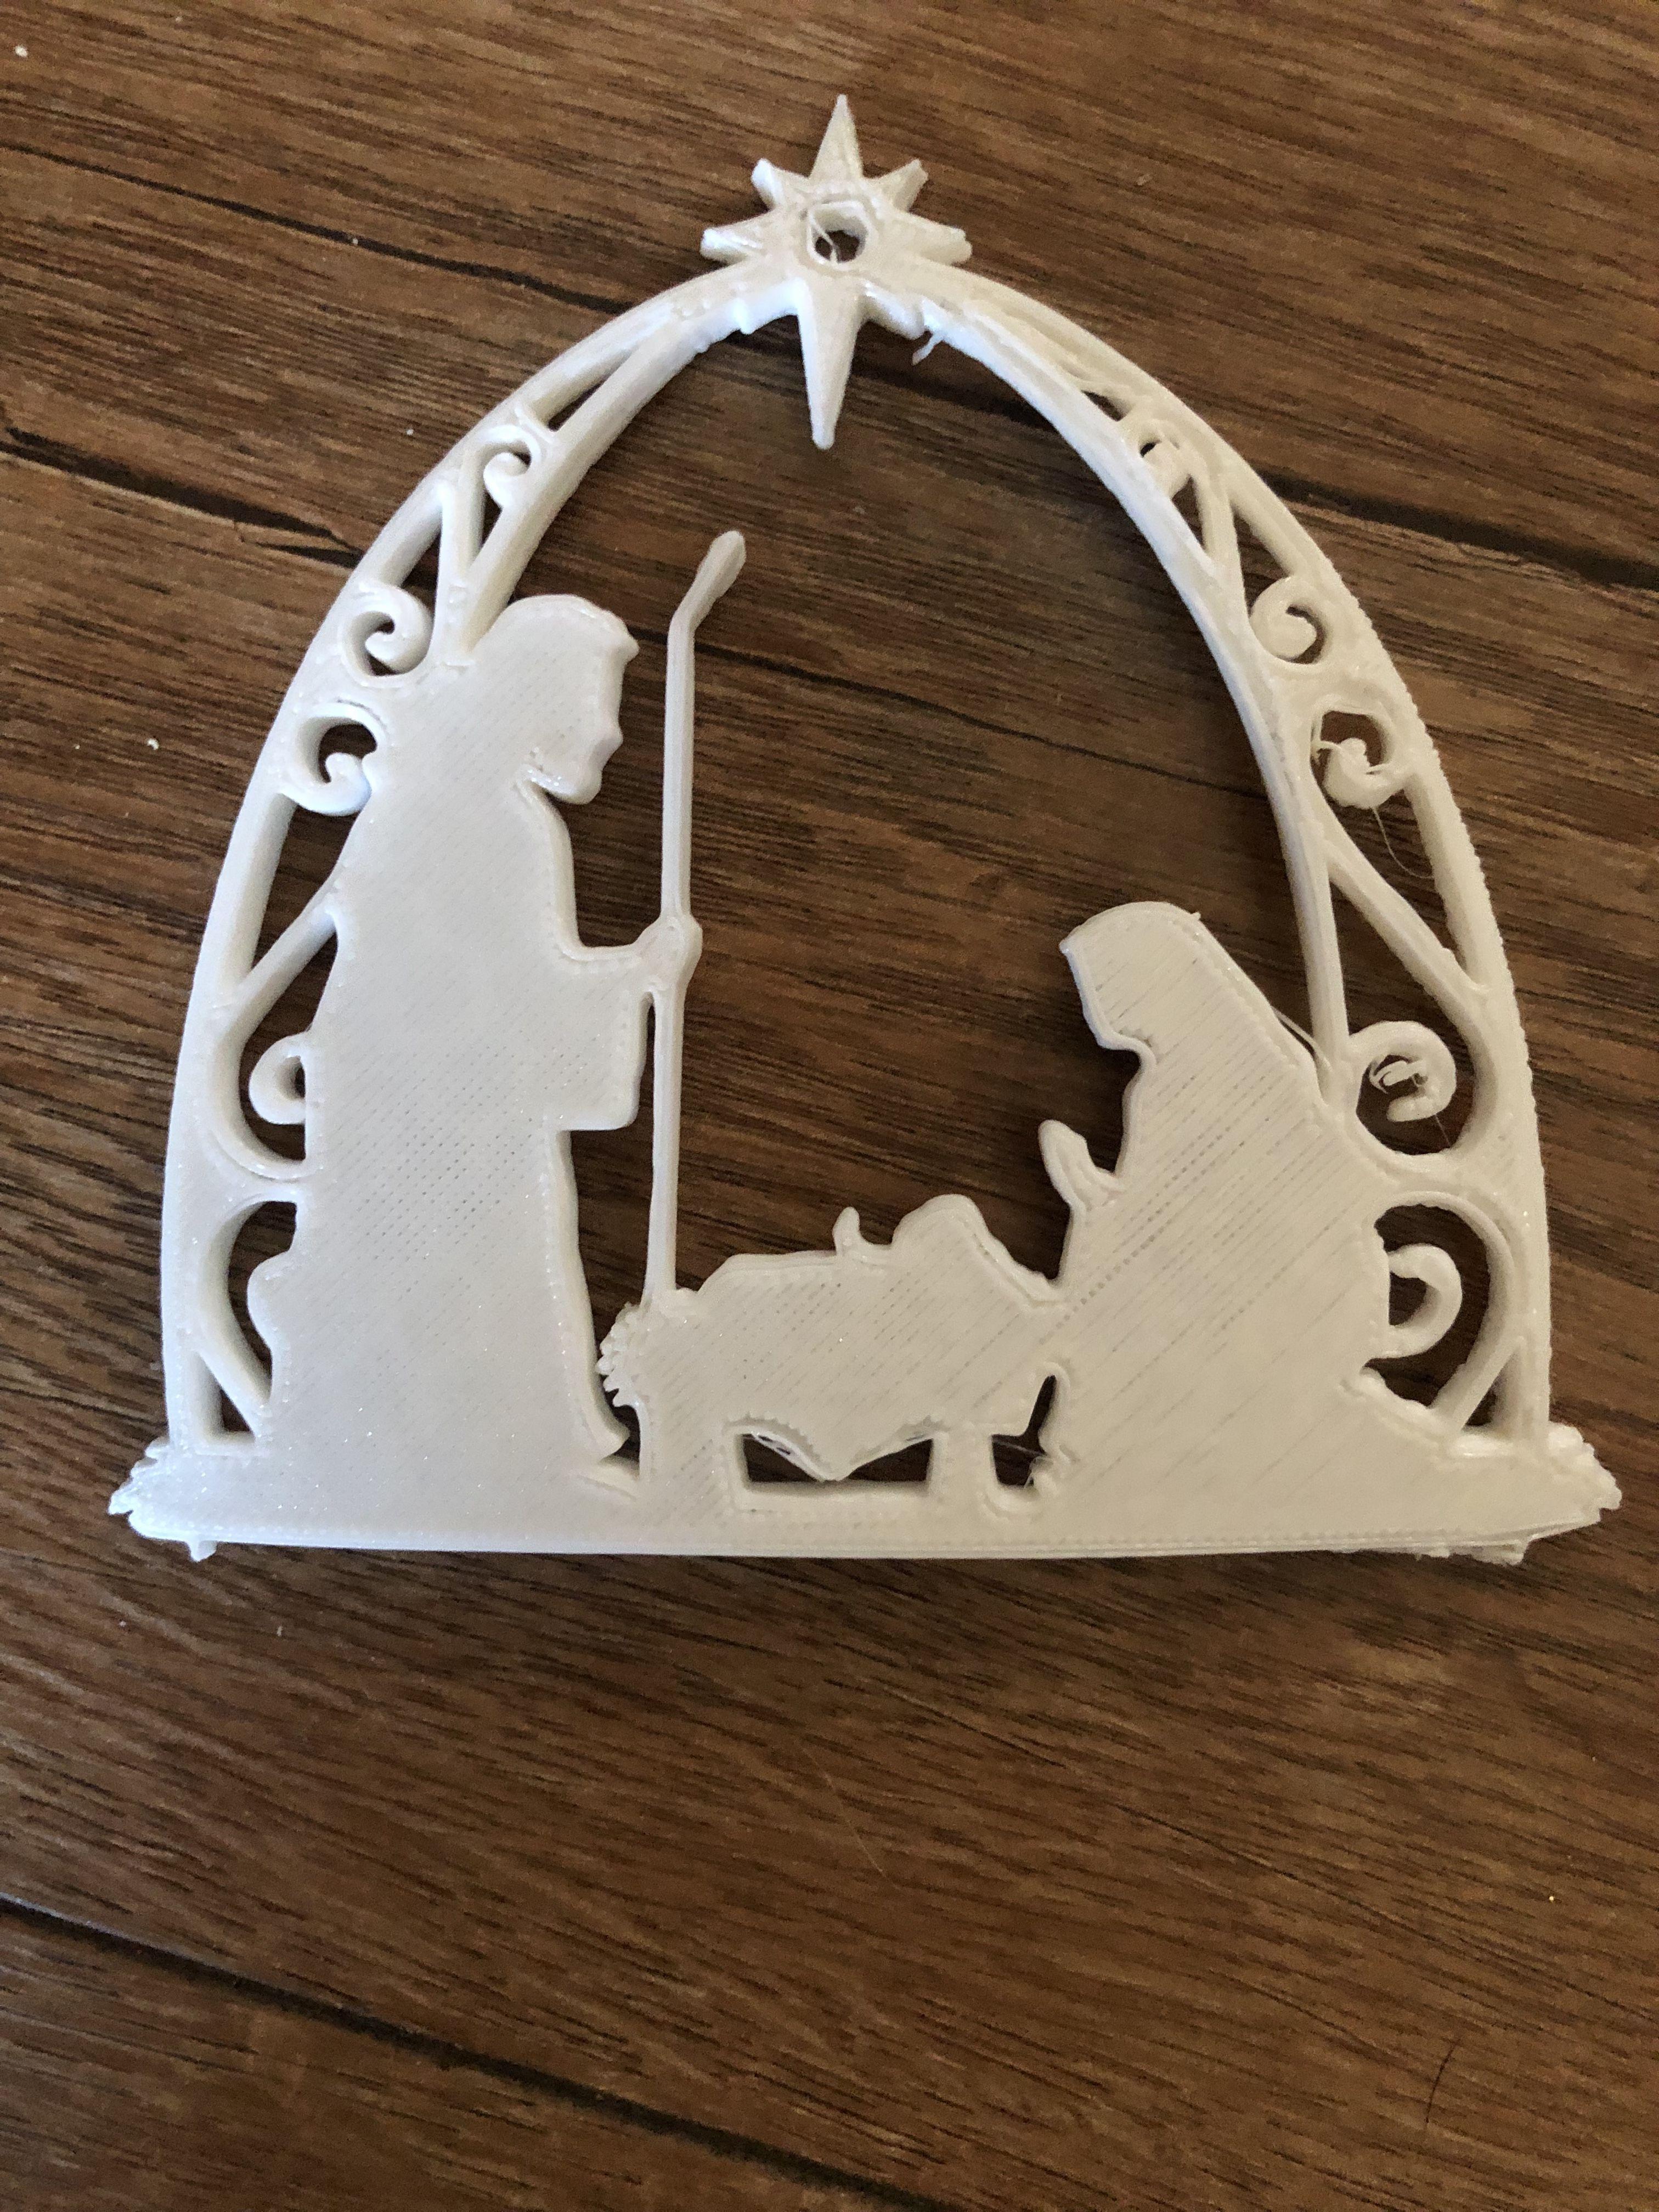 Nativity ornament created on 3d printer